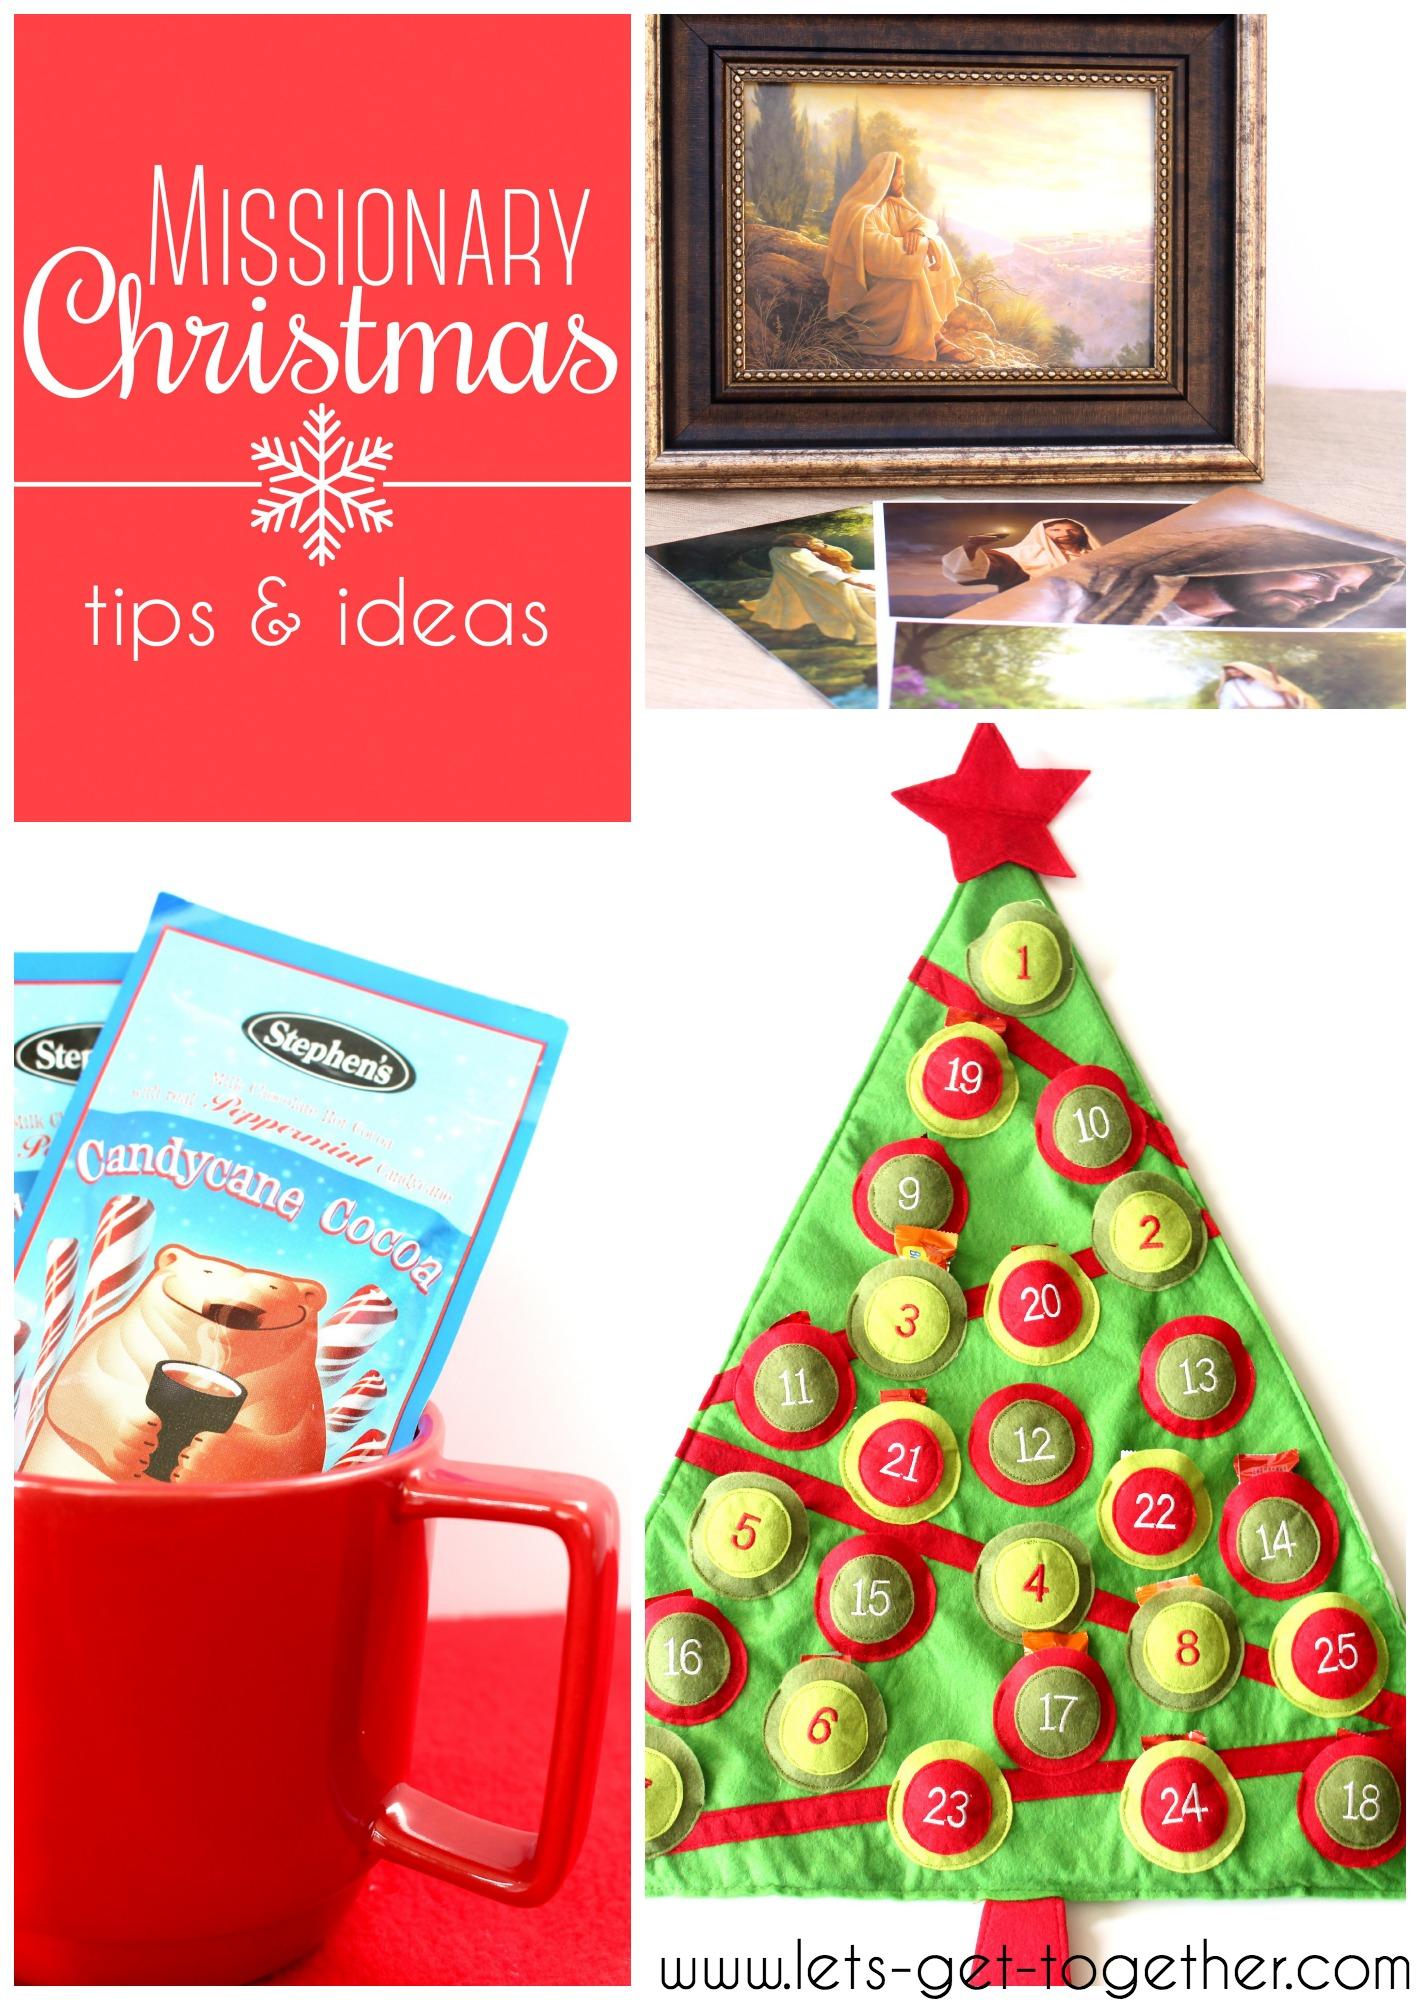 Missionary Christmas: Tips & Ideas